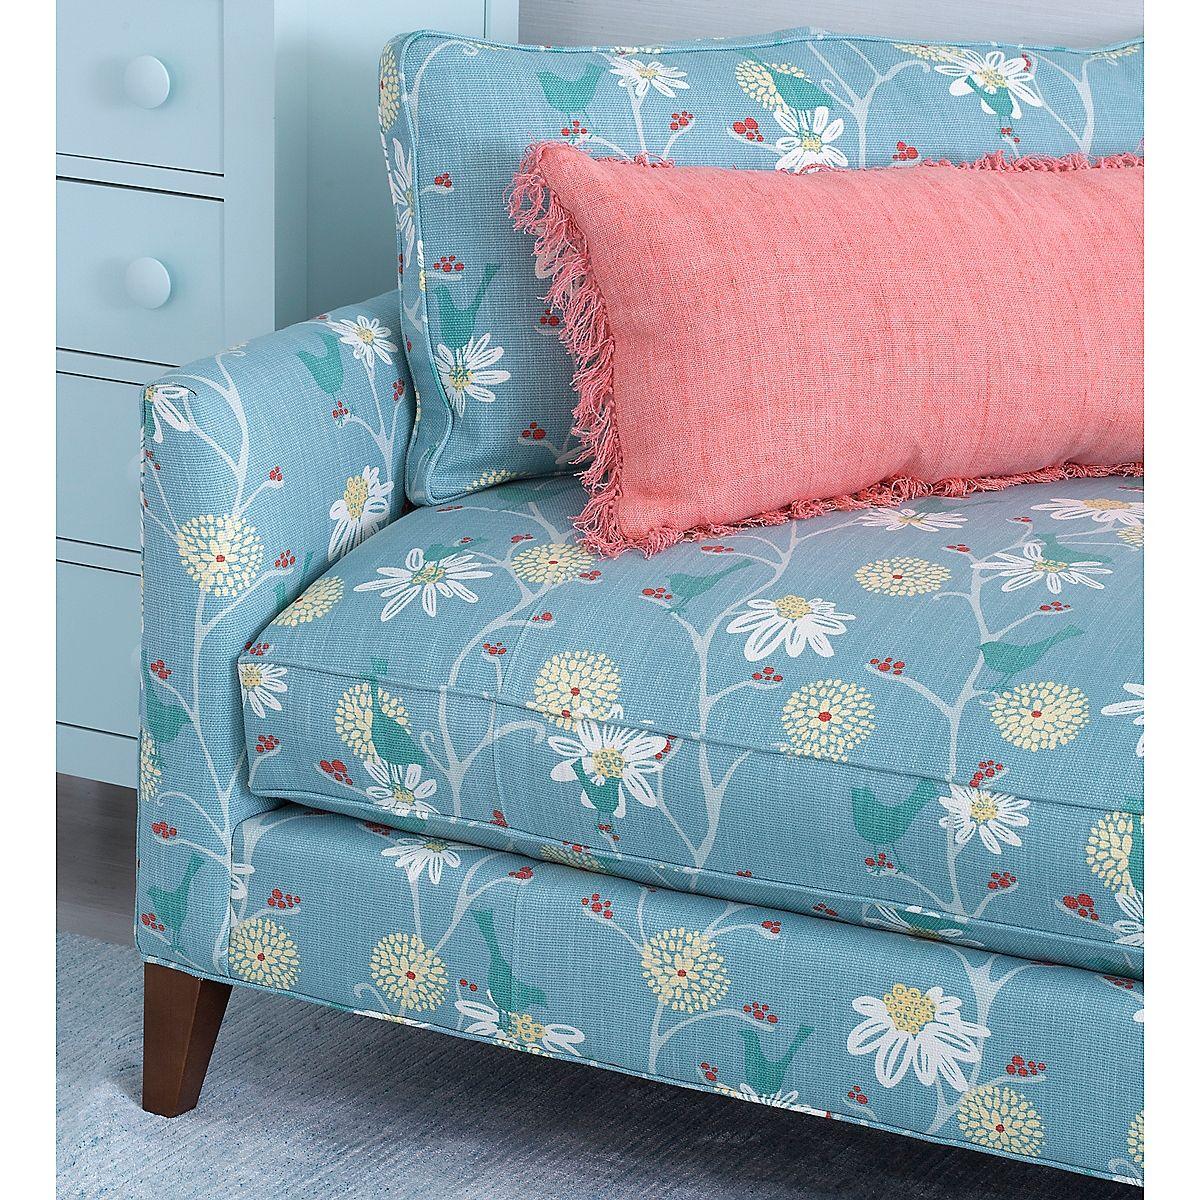 Laundered Linen Decorative Pillow | Maine Cottage